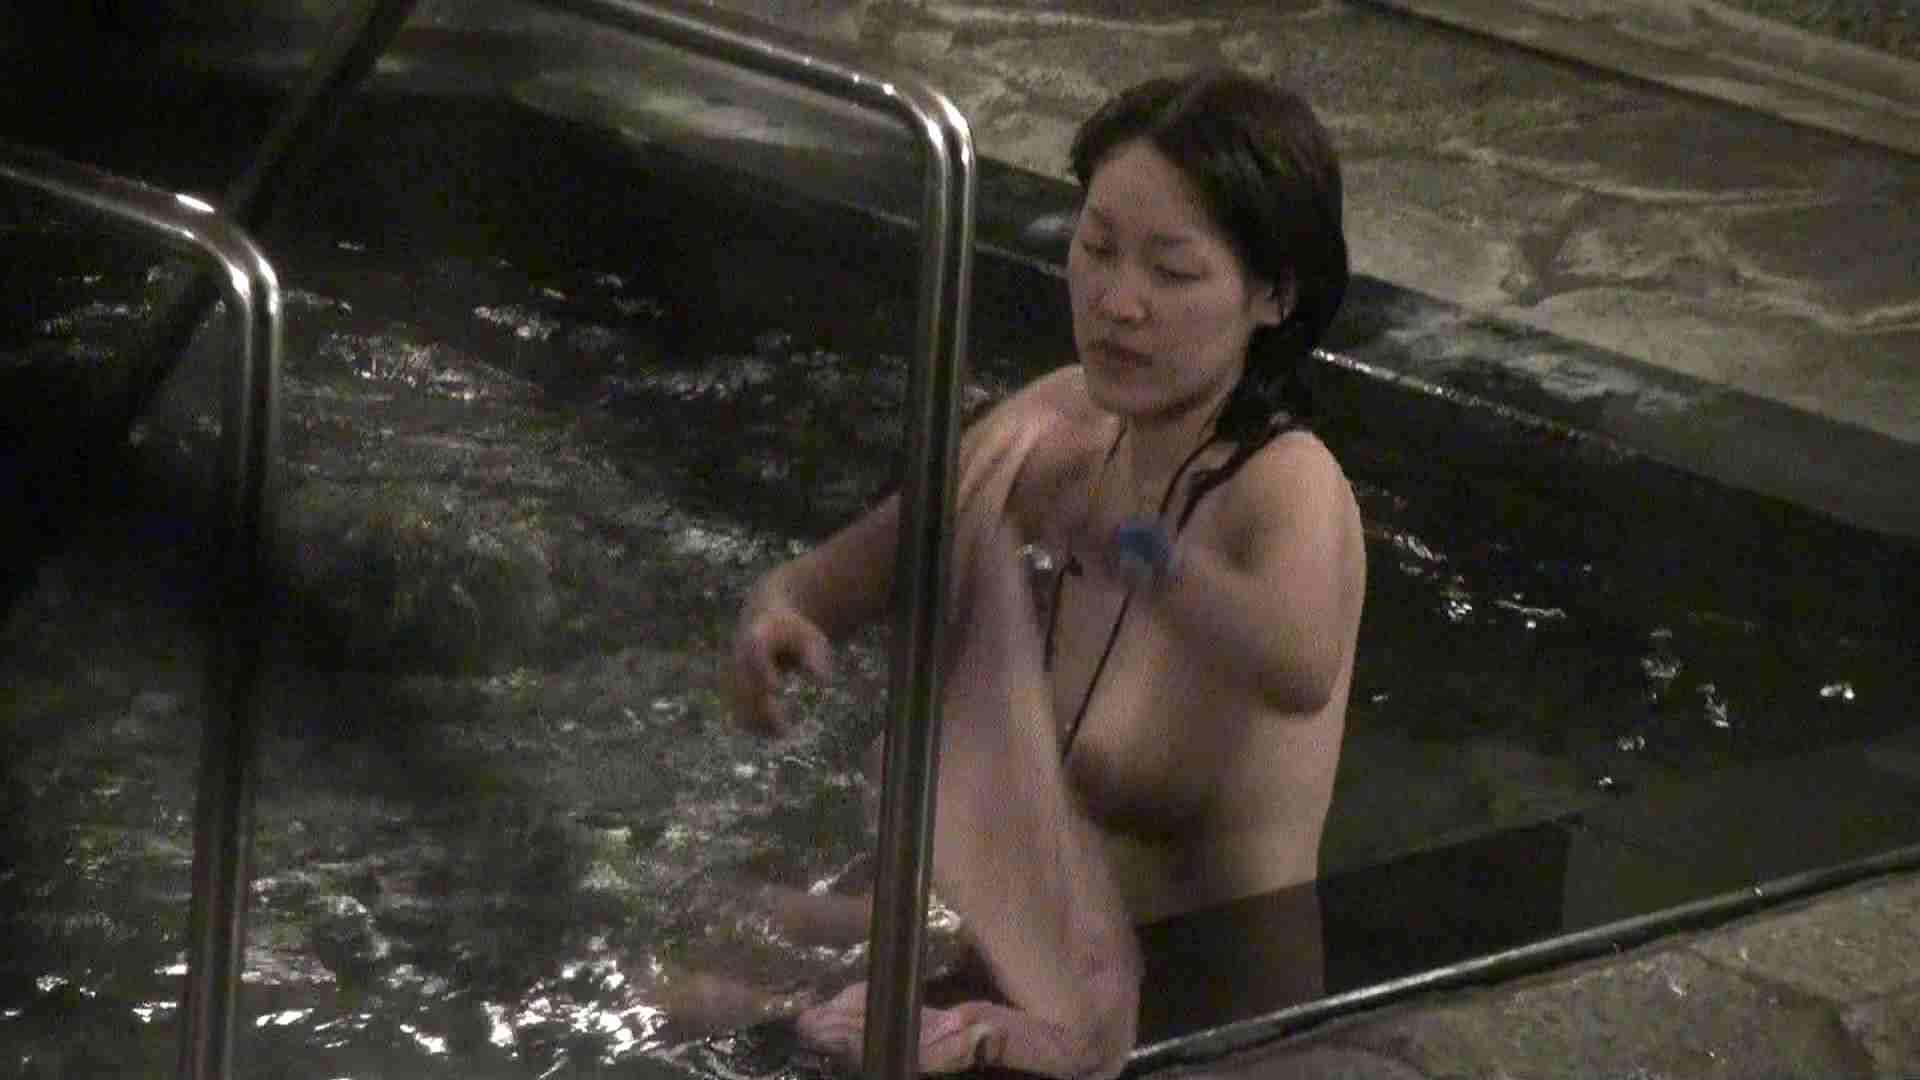 Aquaな露天風呂Vol.414 盗撮師作品  75pic 39